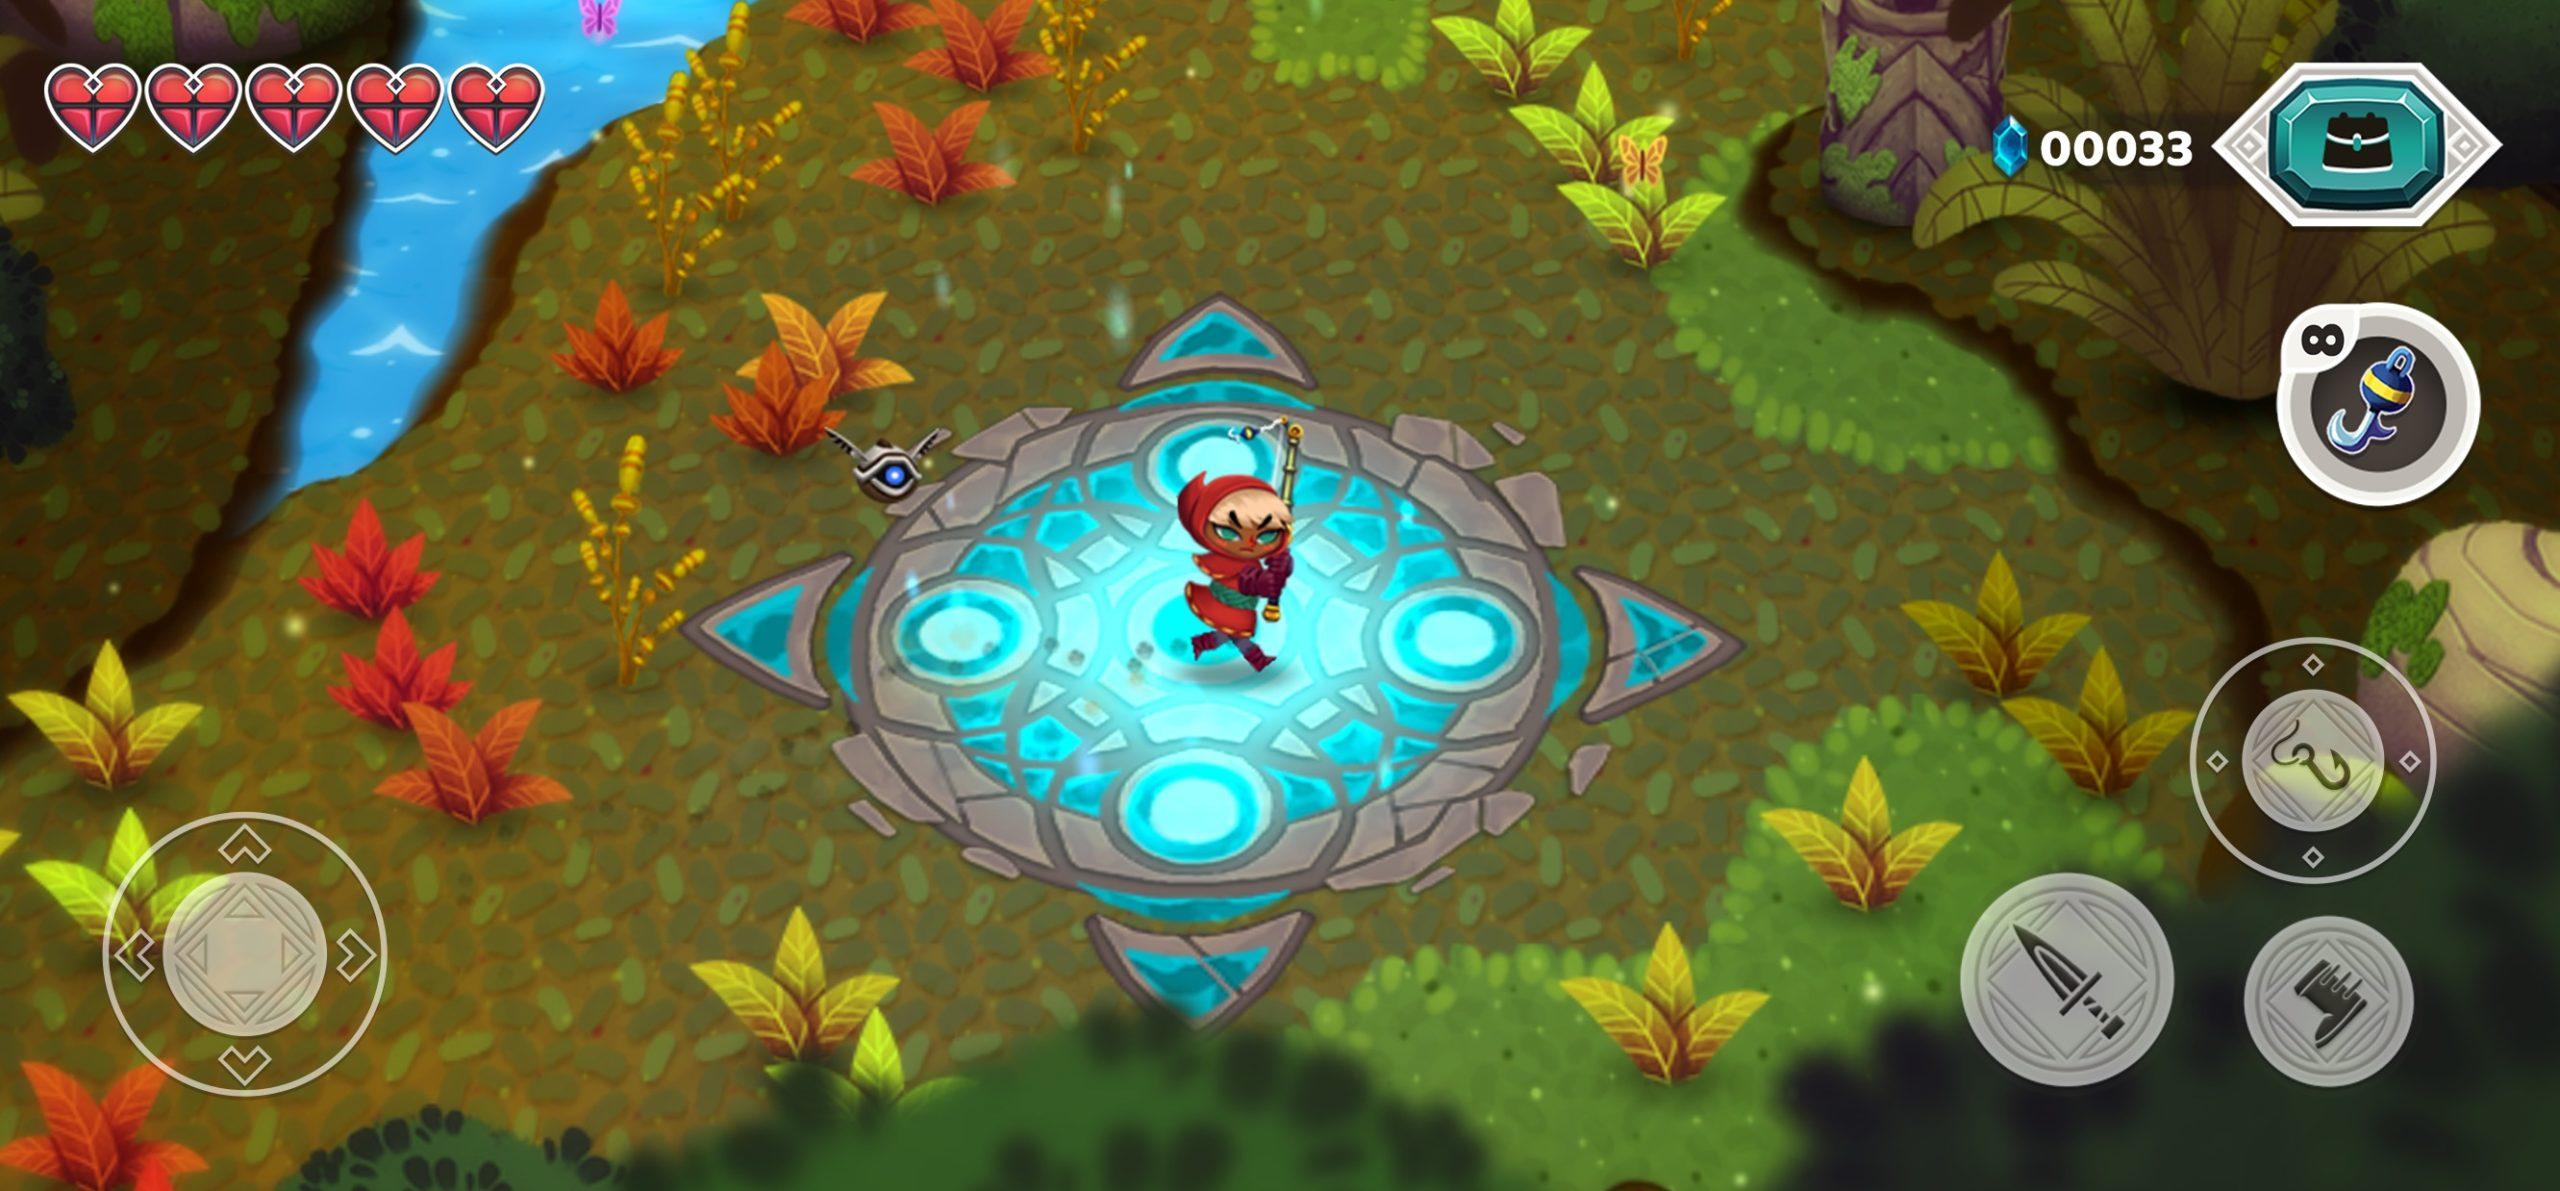 Legend of the Skyfish 2 approda su Apple Arcade